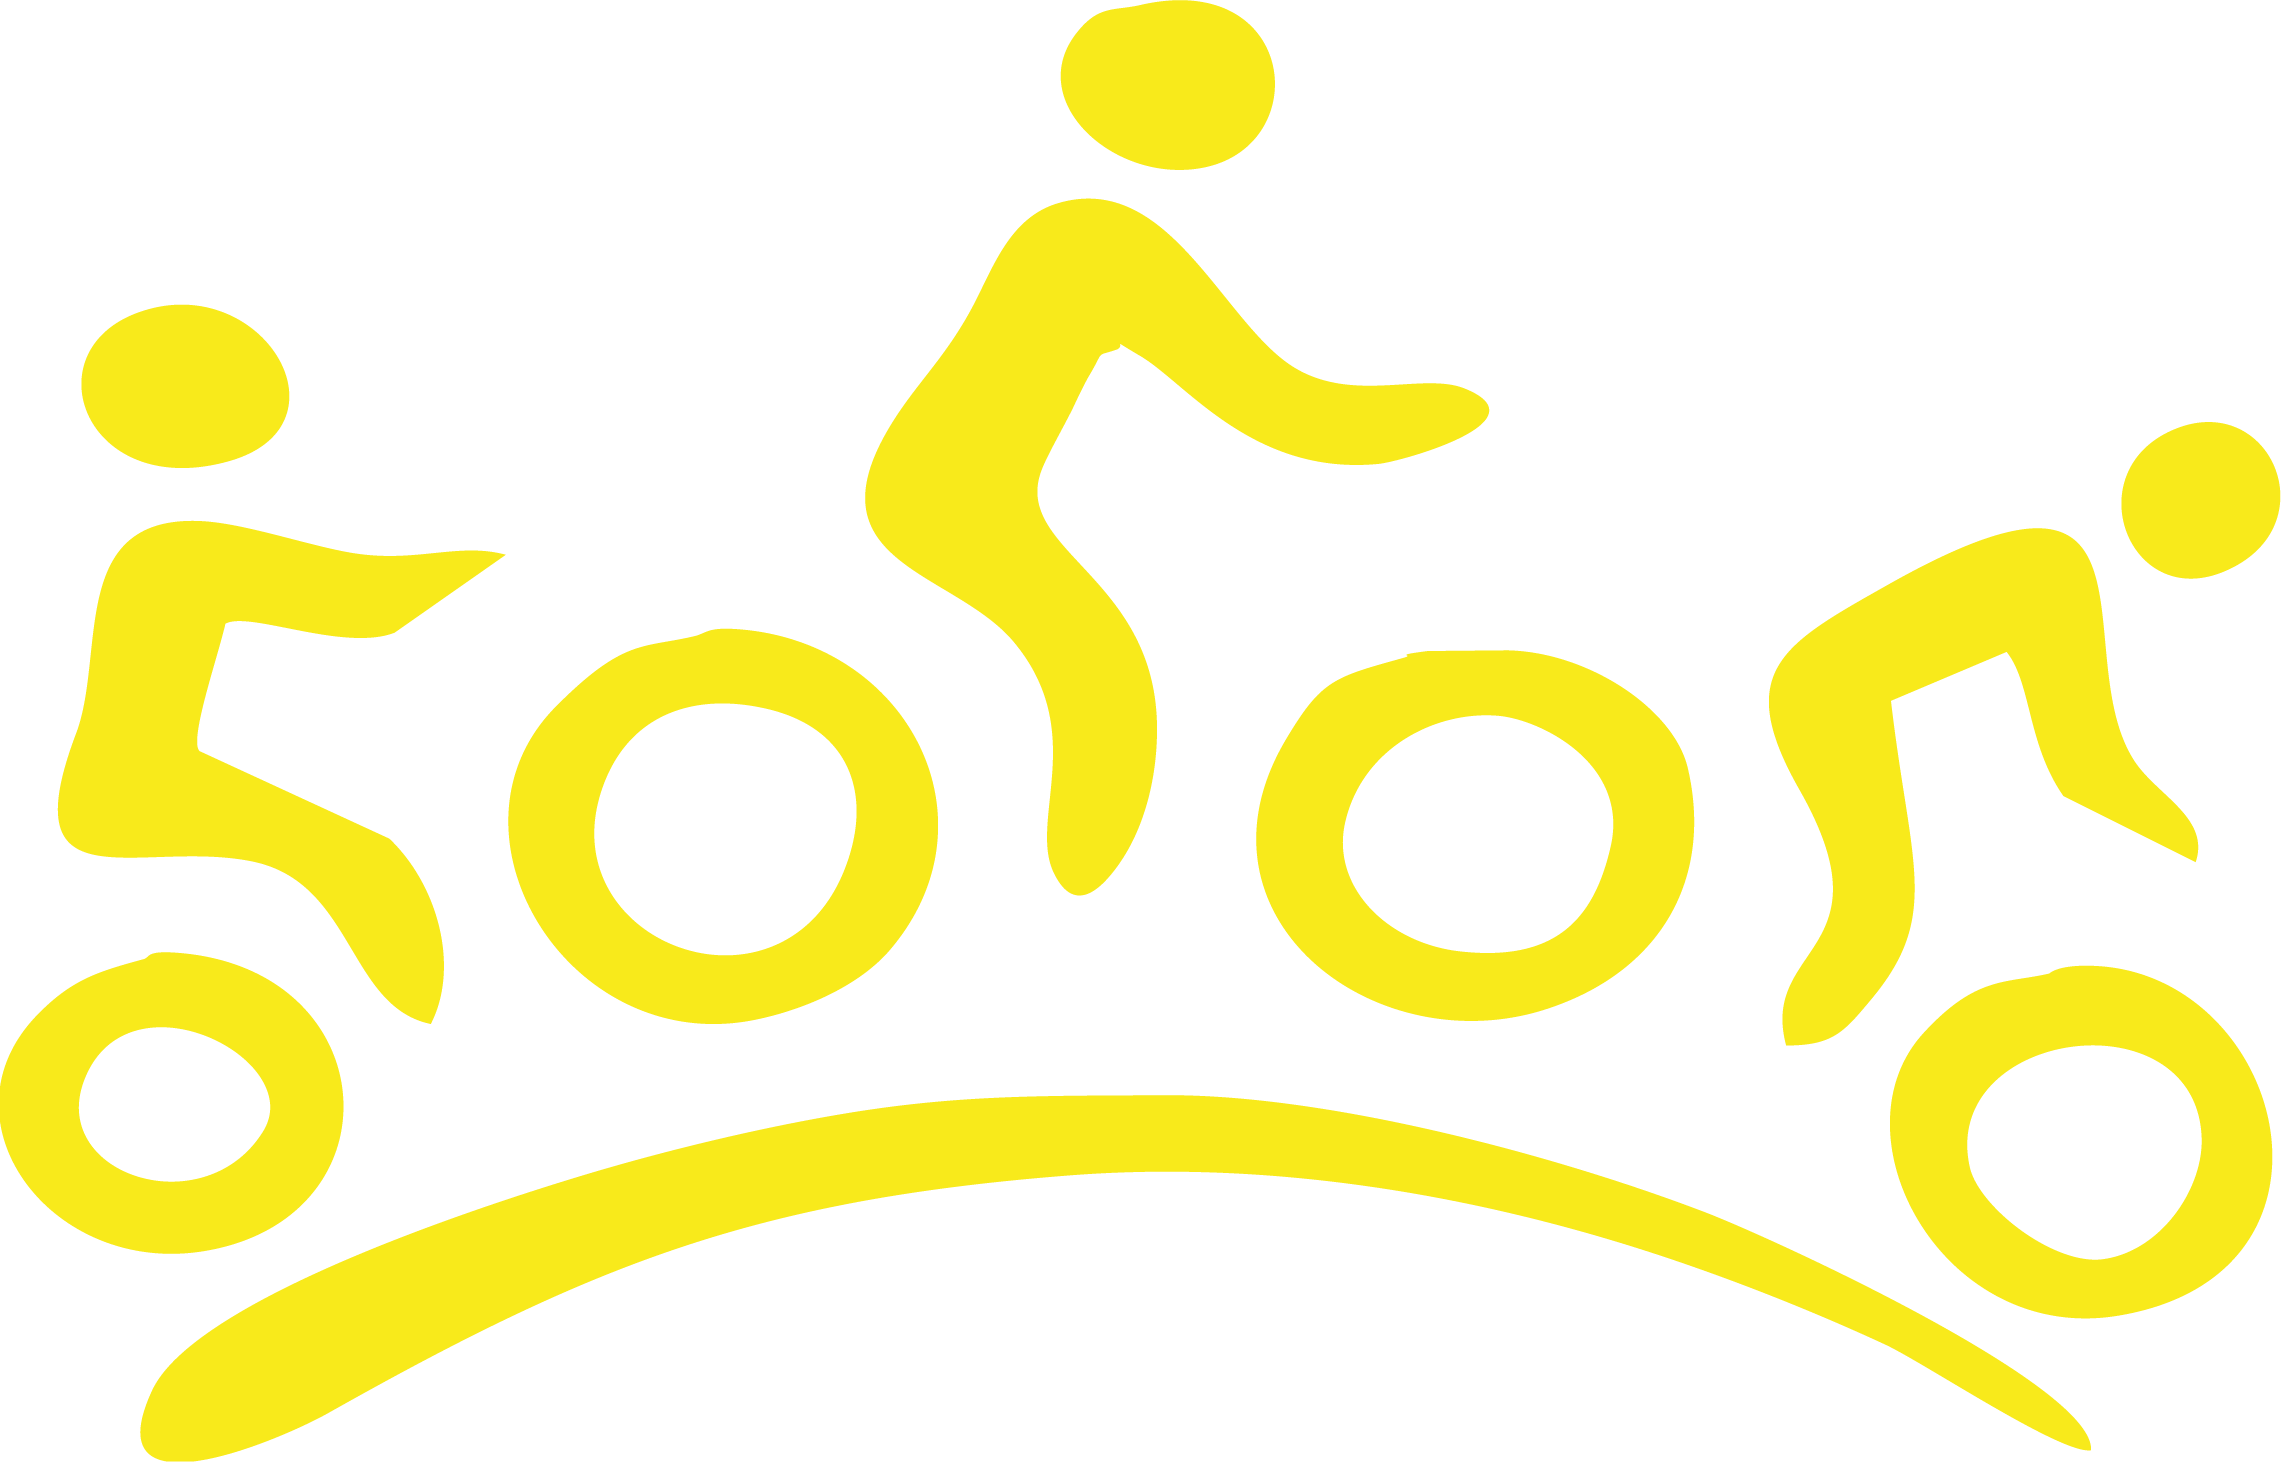 logo rajd